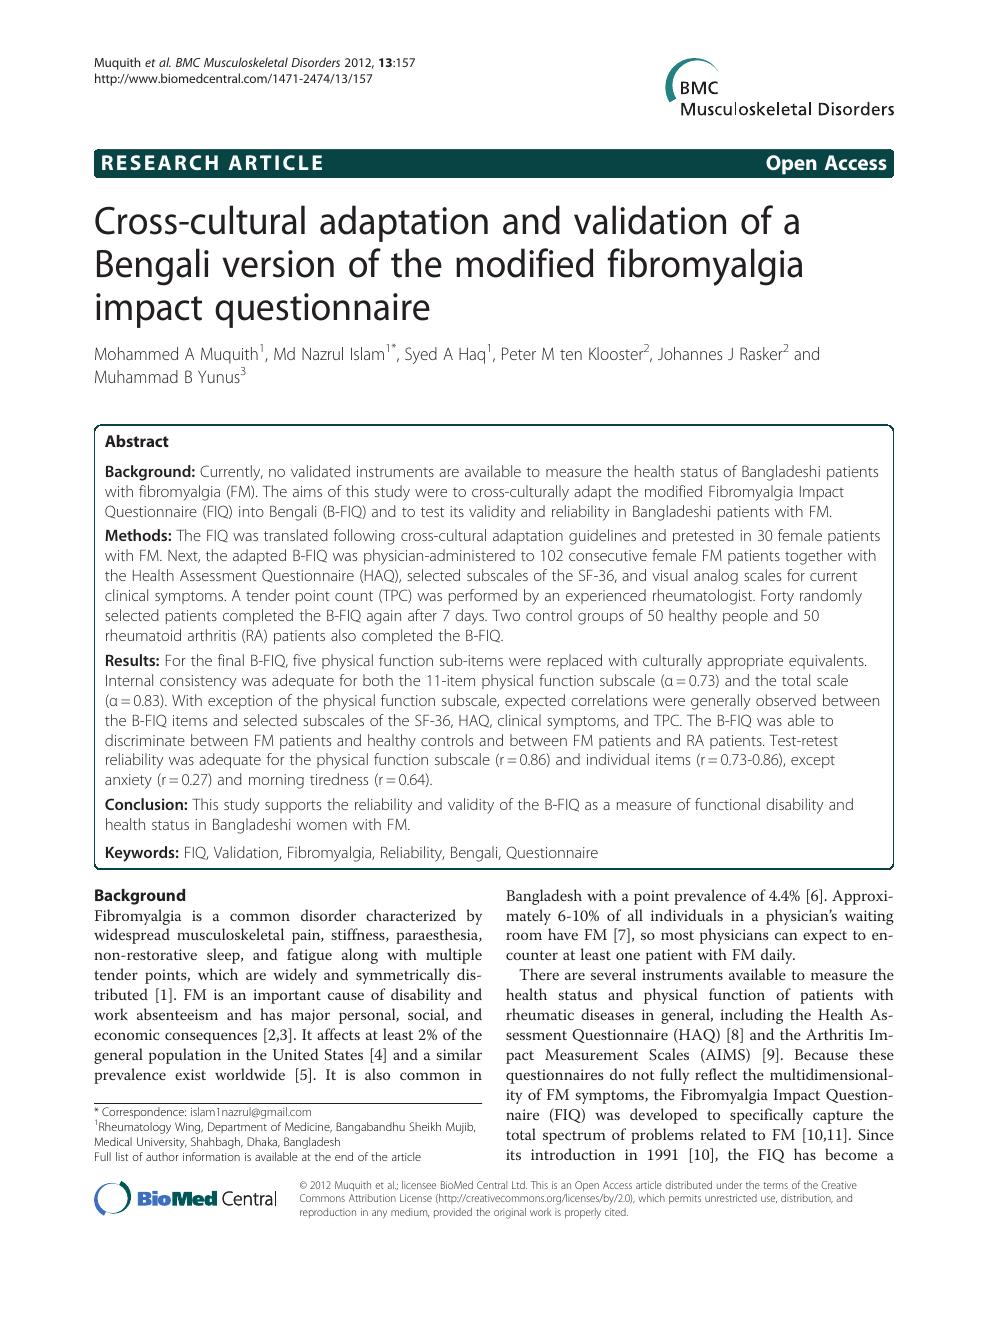 Cross-cultural adaptation and validation of a Bengali